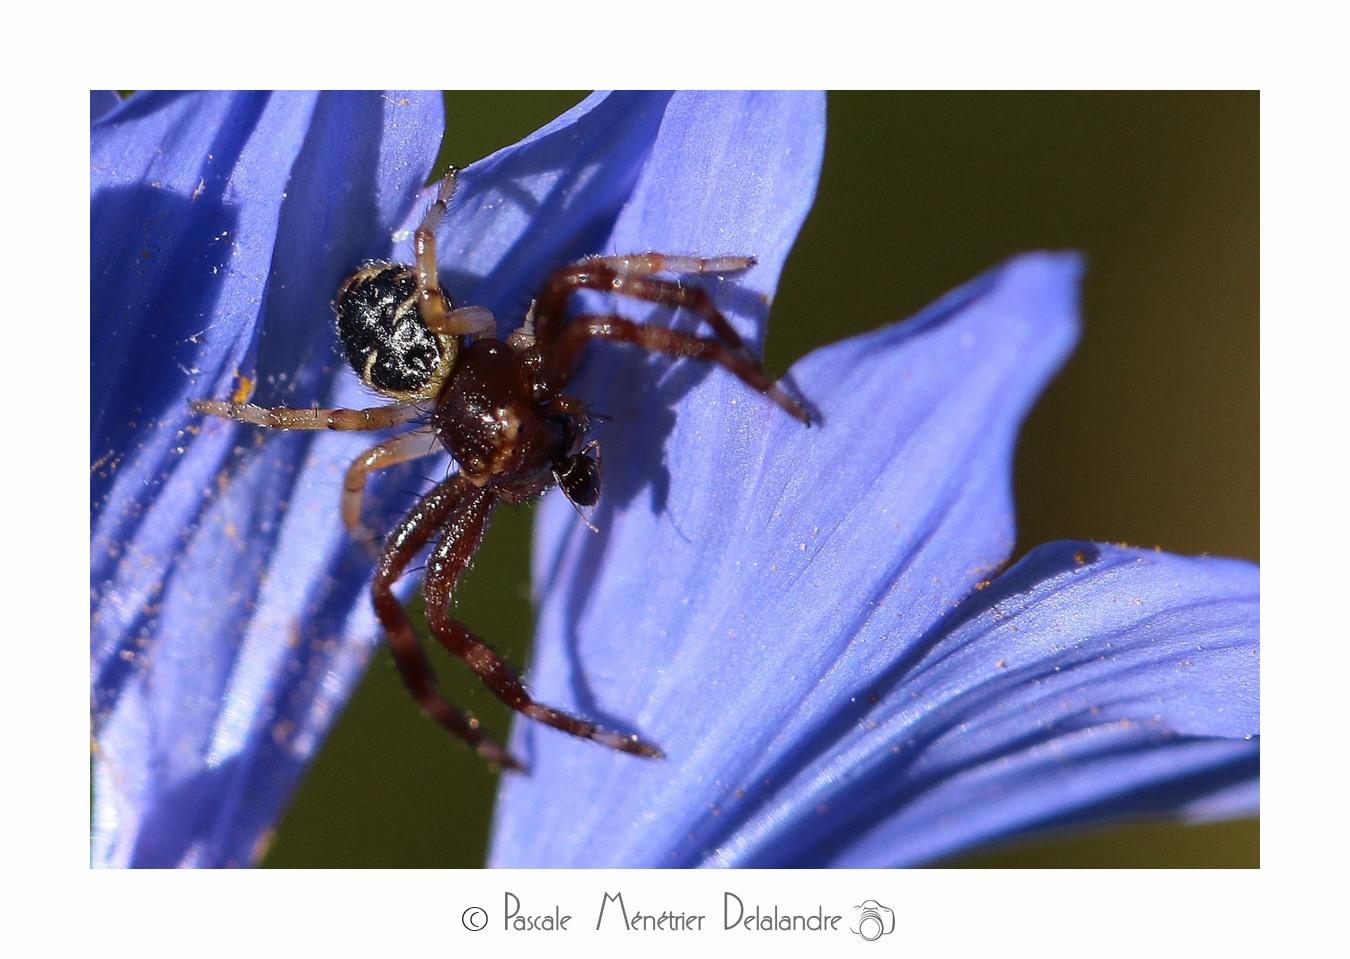 Synema globosum ♀ ( Thomise globuleuse, Thomise globuleux, Araignée-crabe ou Araignée Napoléon) - Thomisidae